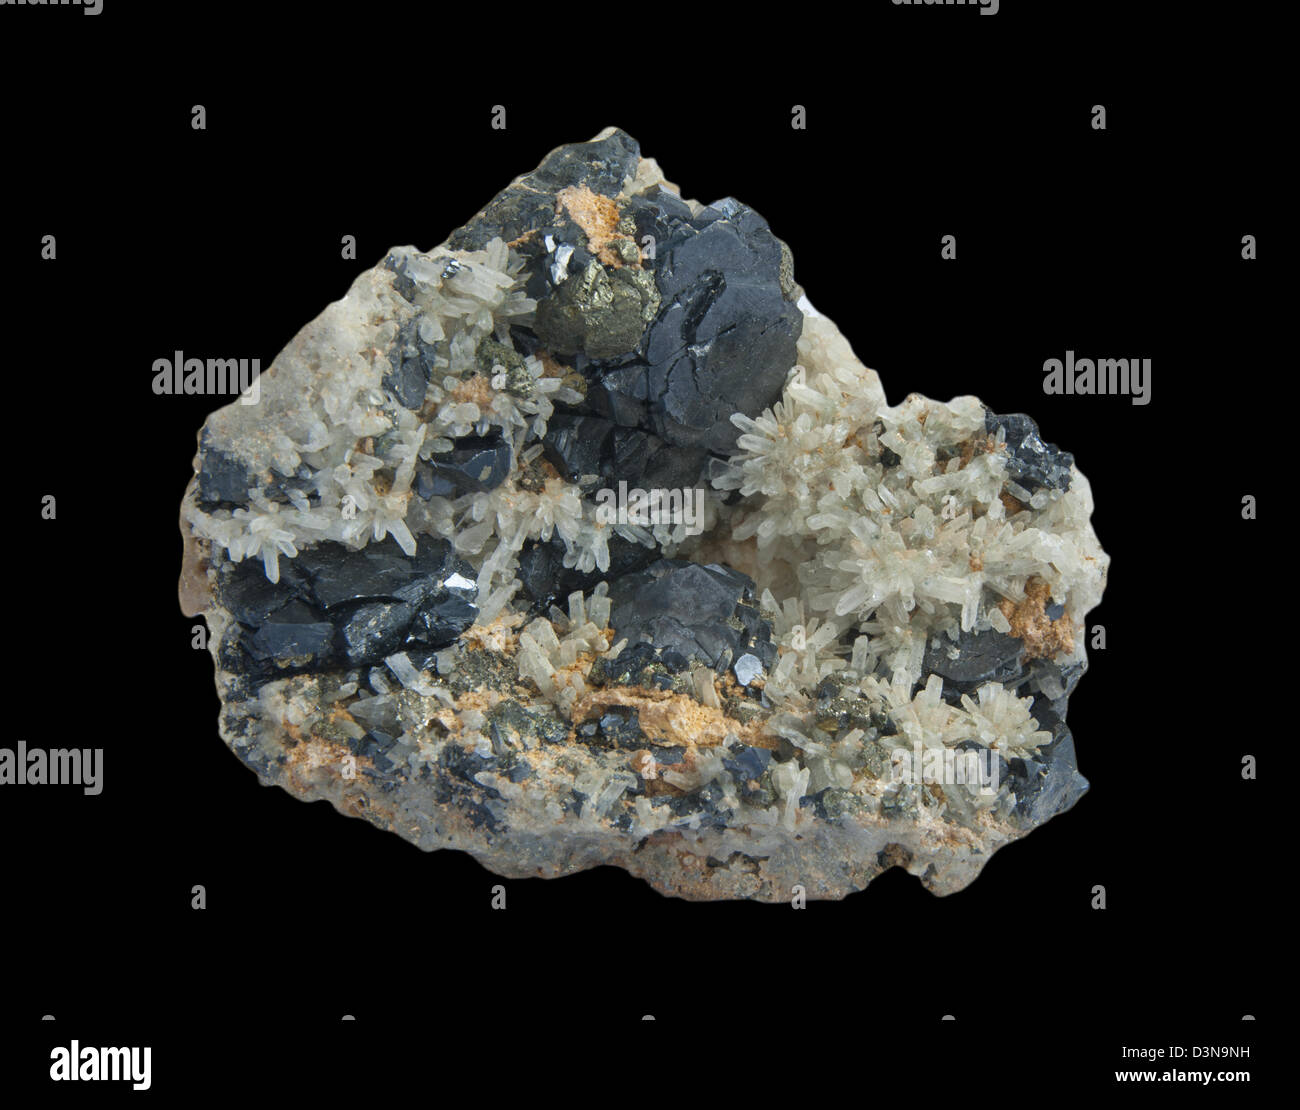 quartz, sphalerite, pyrite isolated on black background - Stock Image